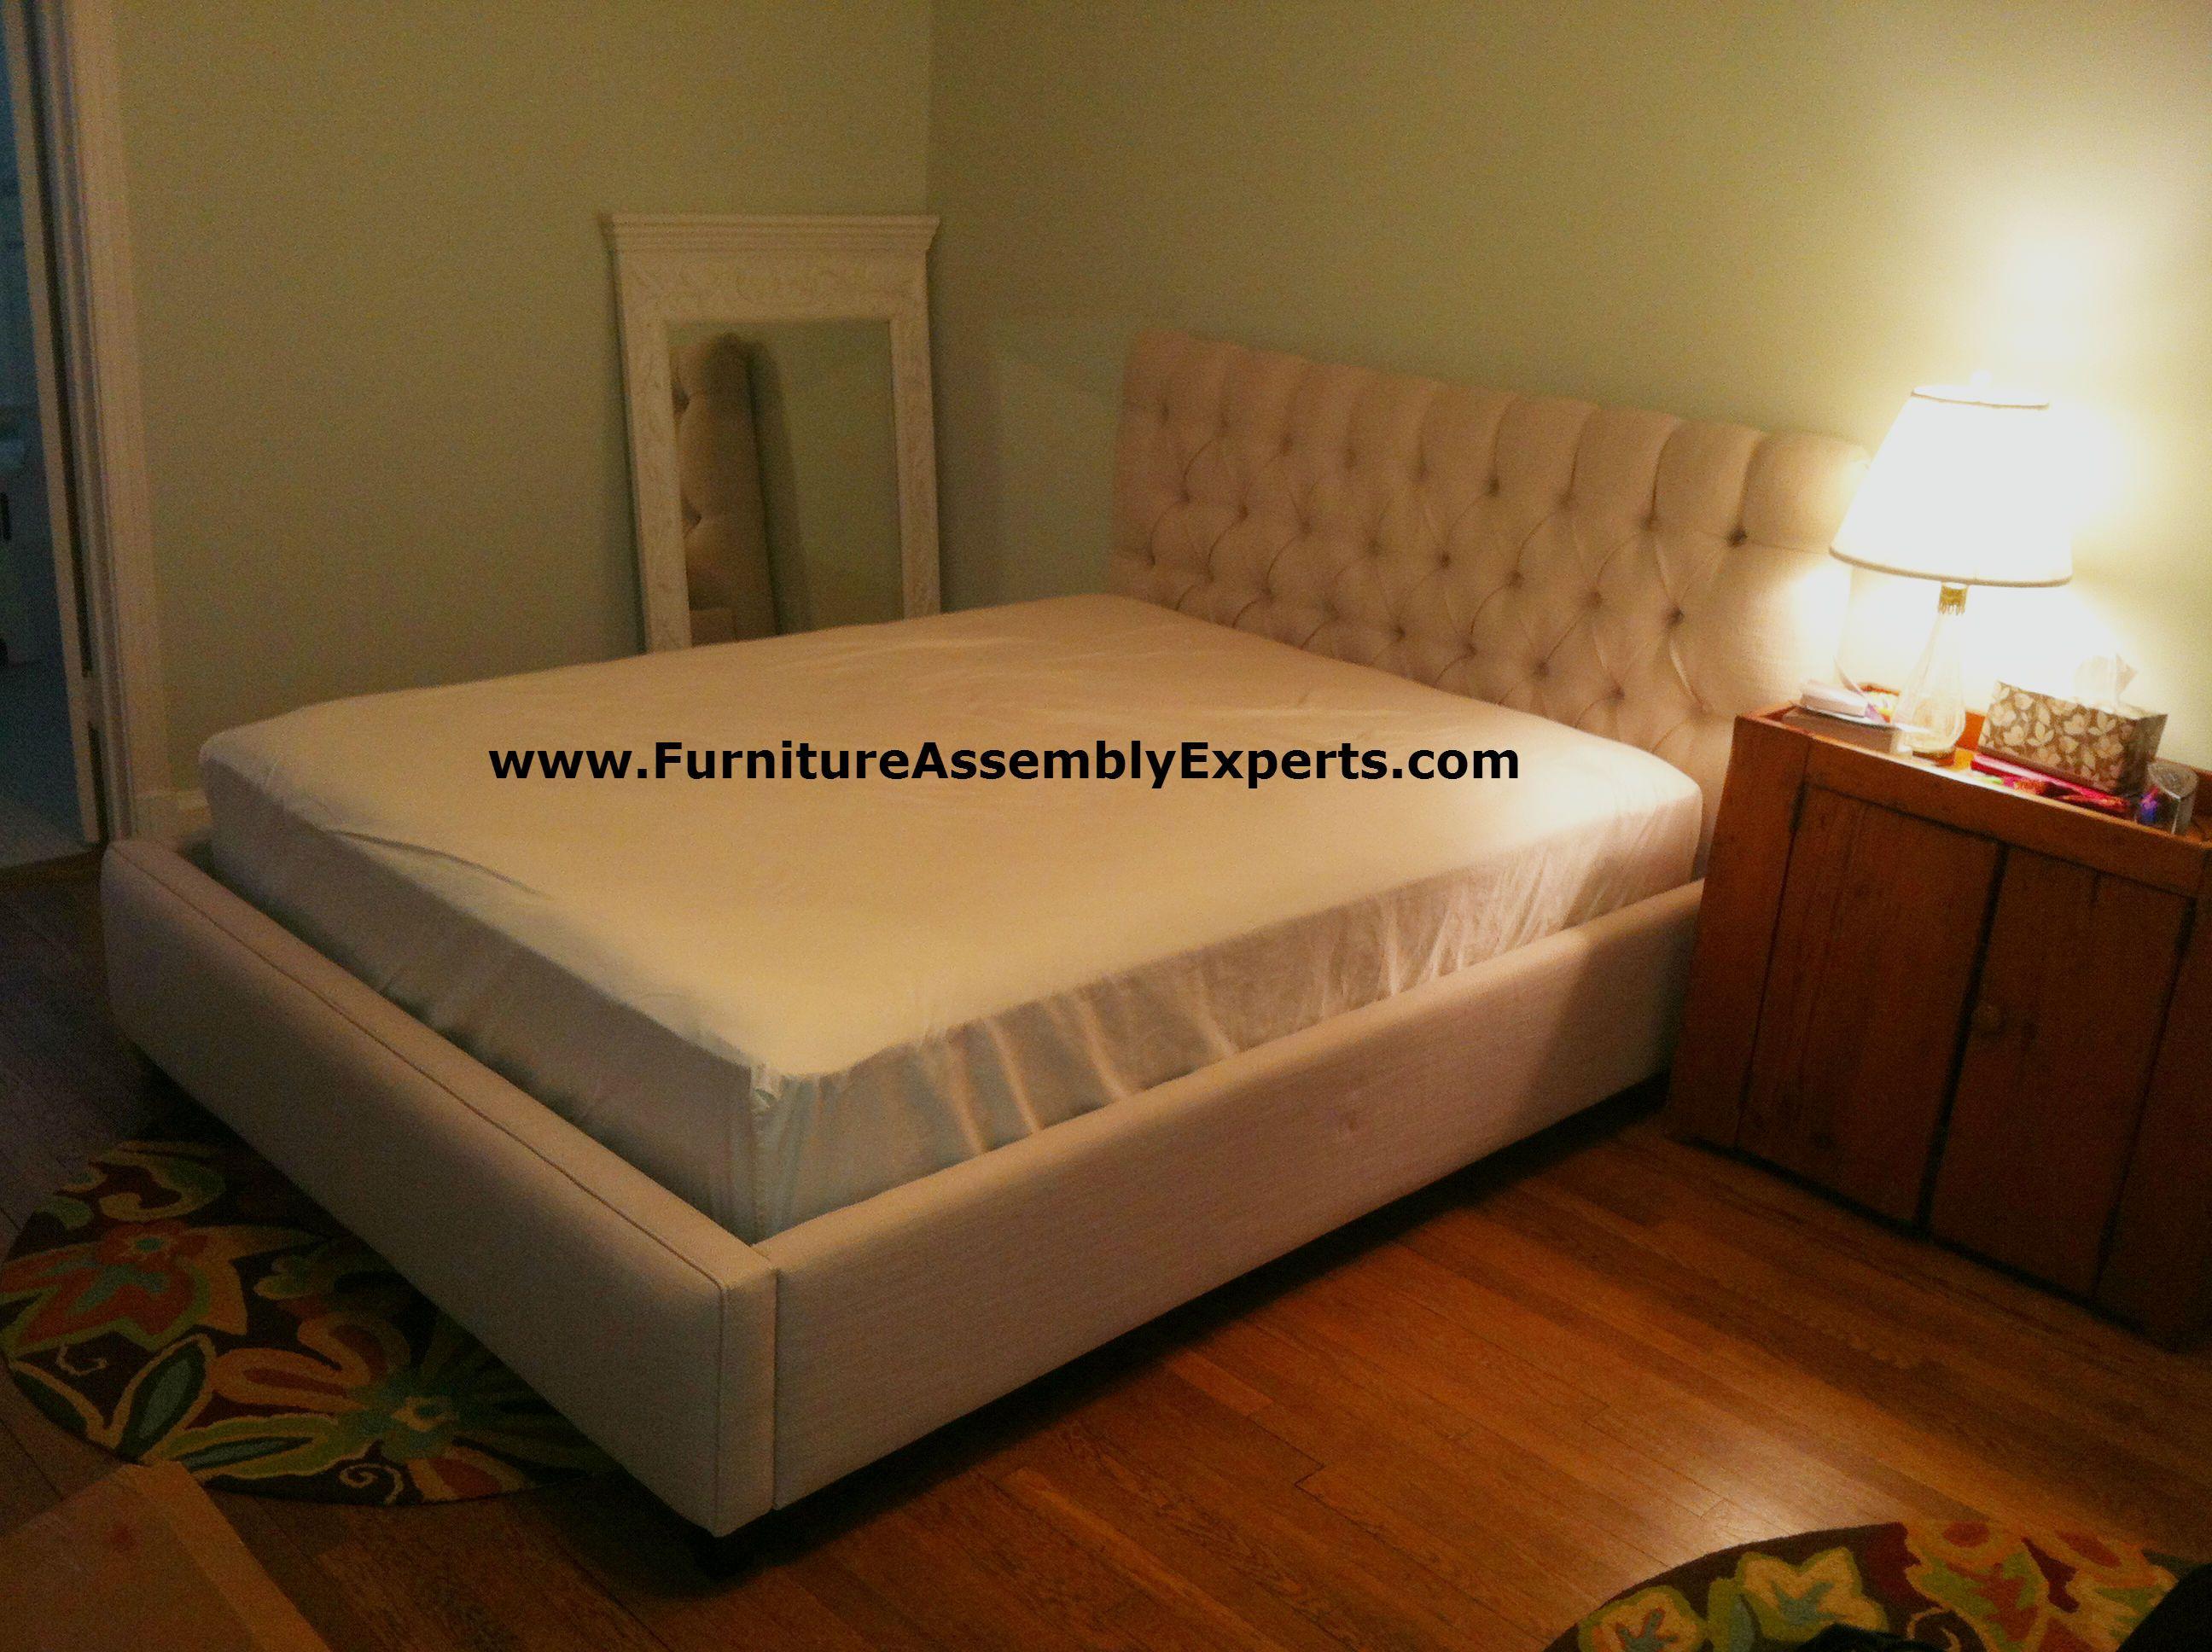 ballard designs tufted queen bed assembled in washington dc